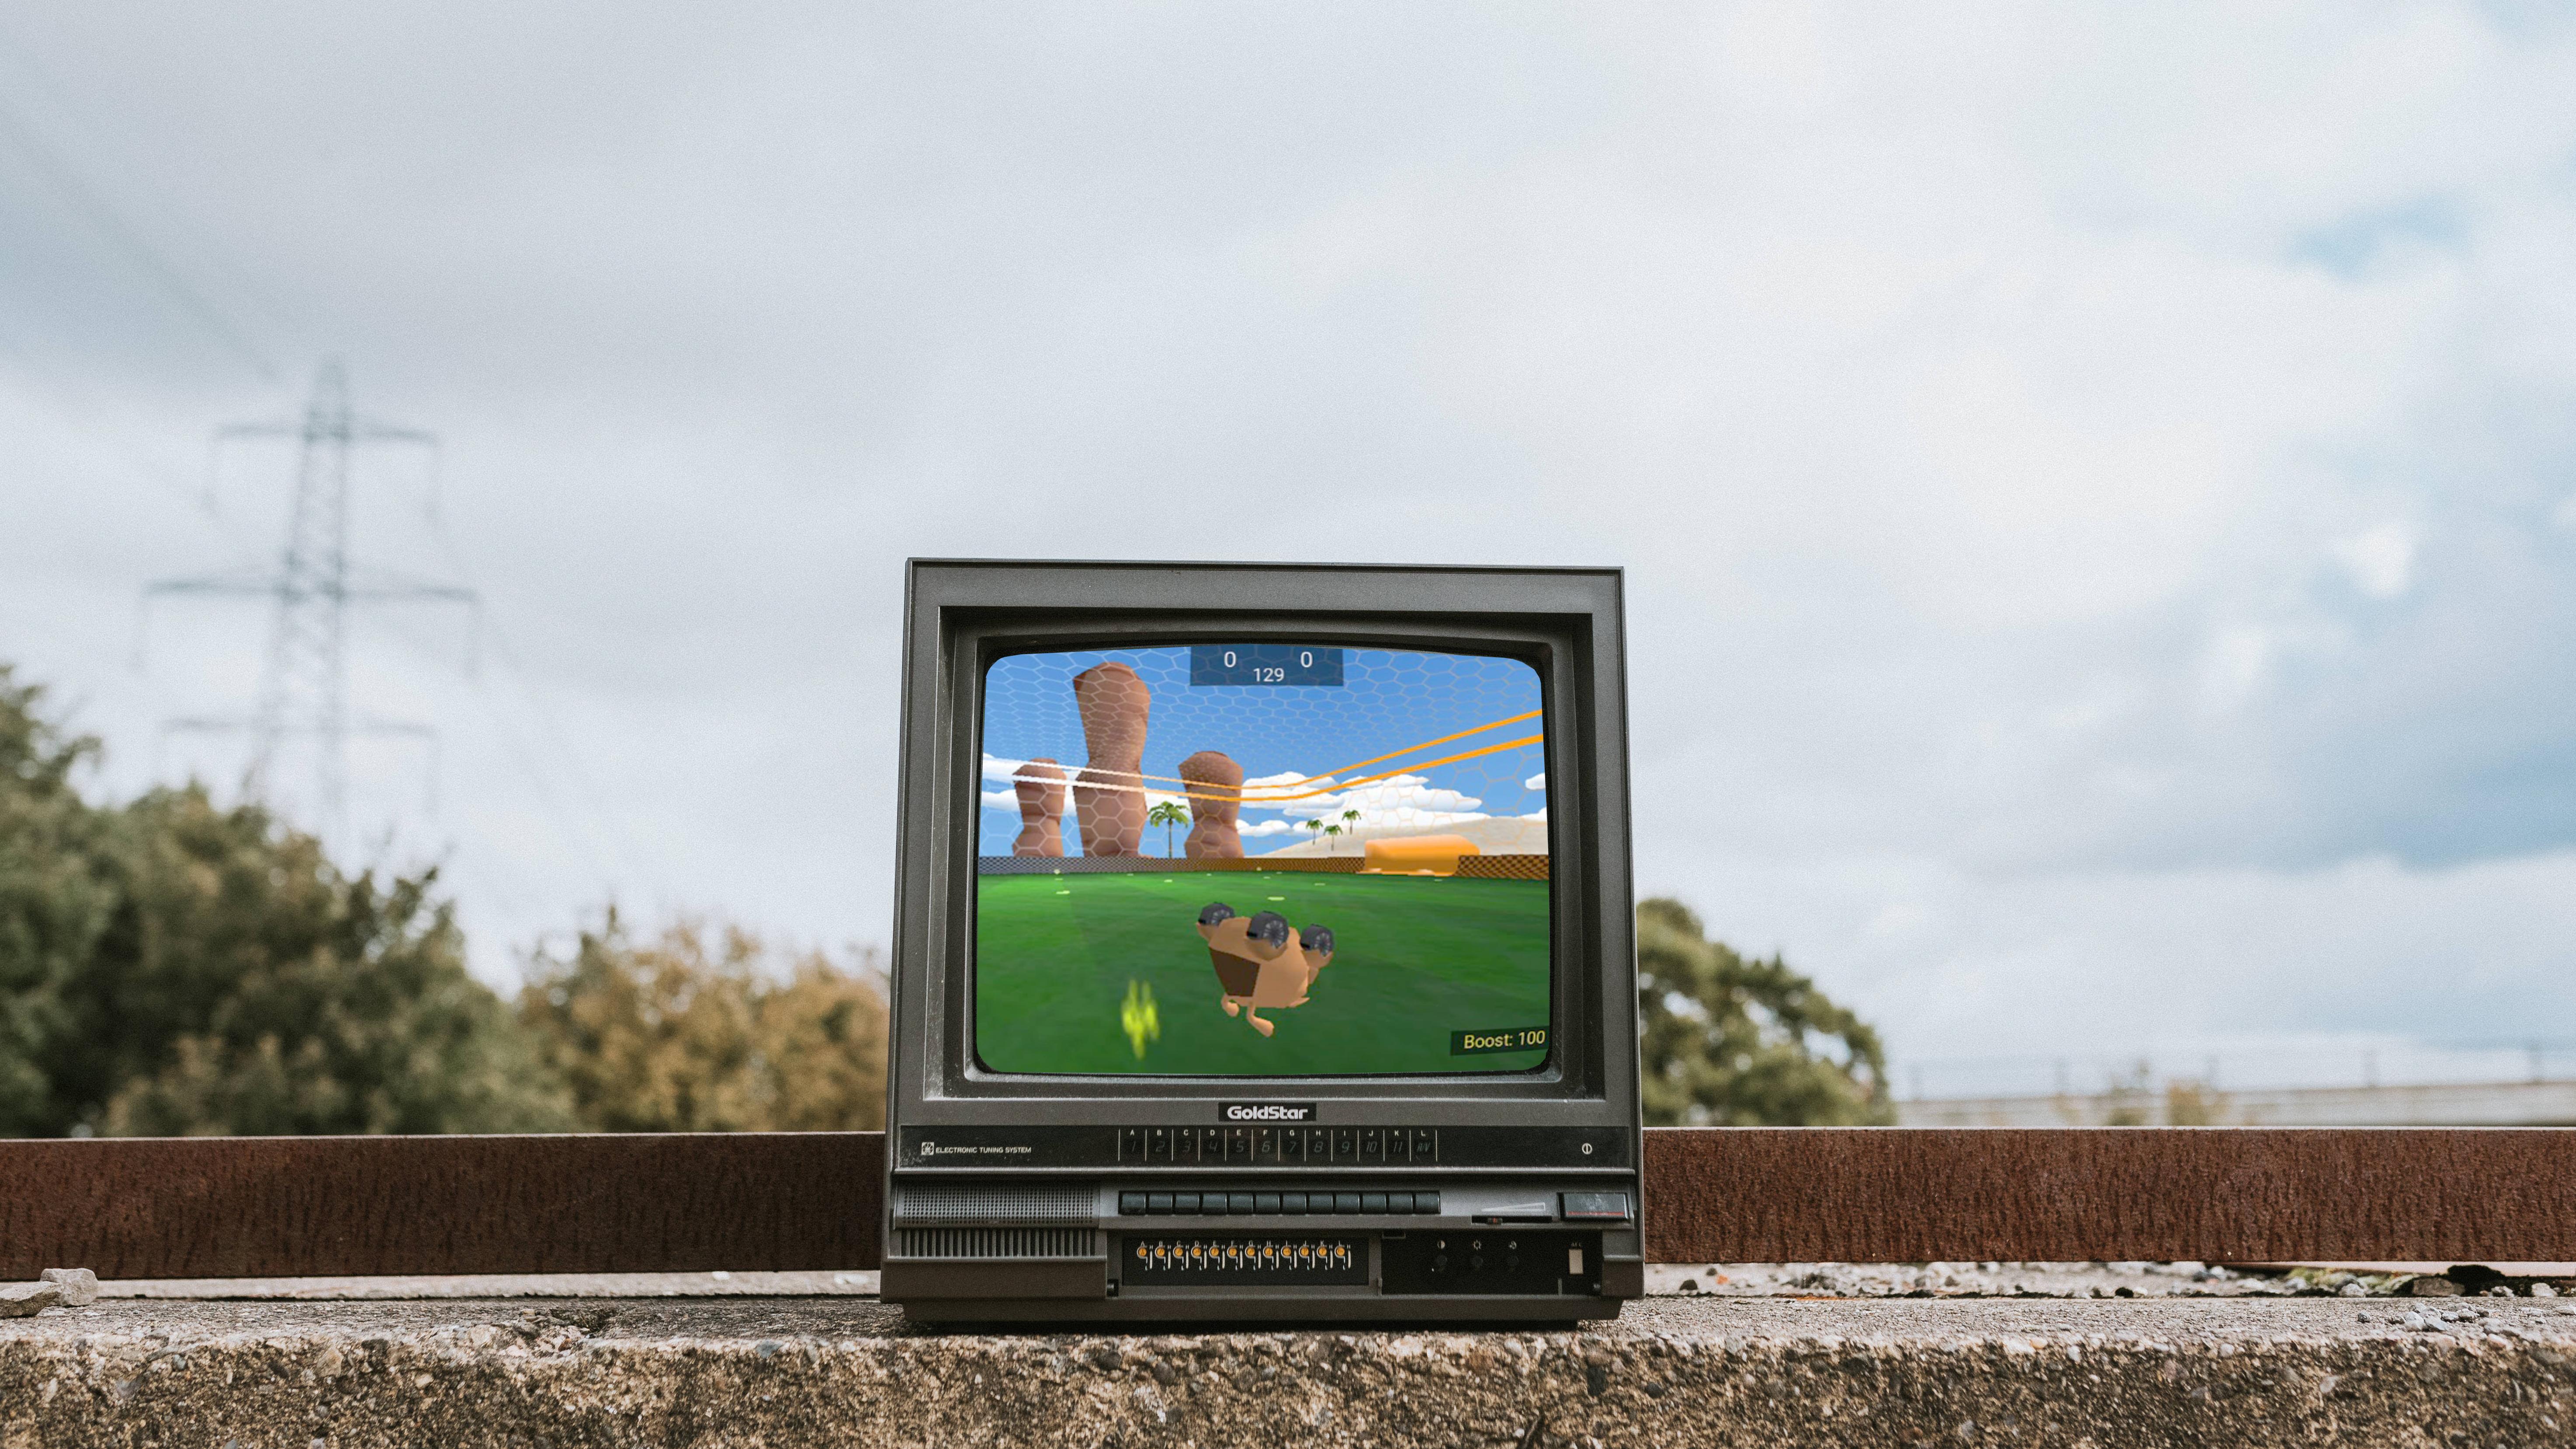 Rocket League Inspired Homebrew Reverses onto Nintendo GameCube